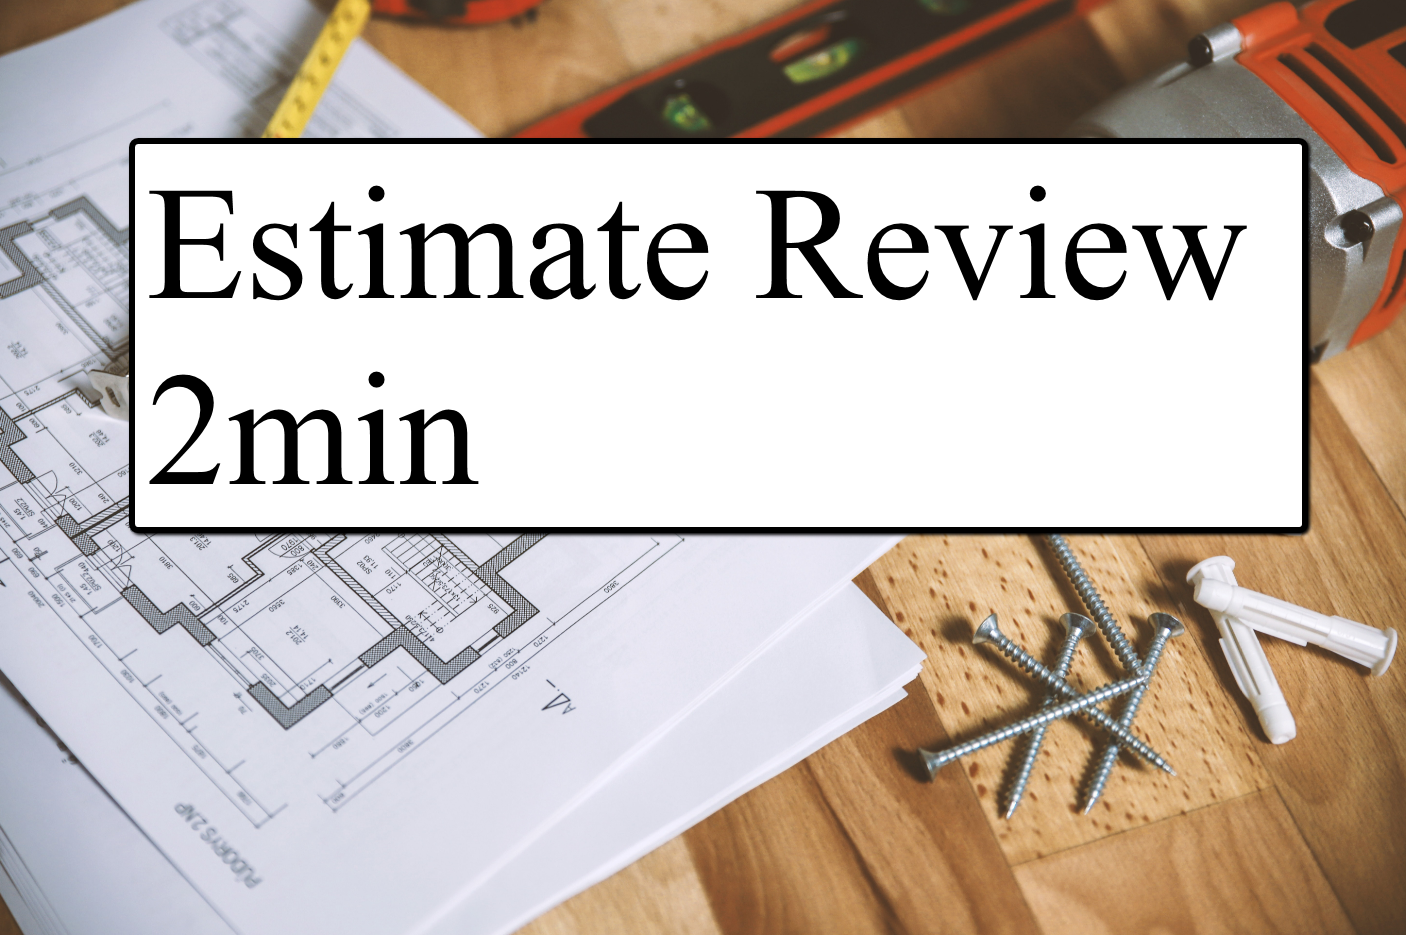 Estimate_Review_001.png